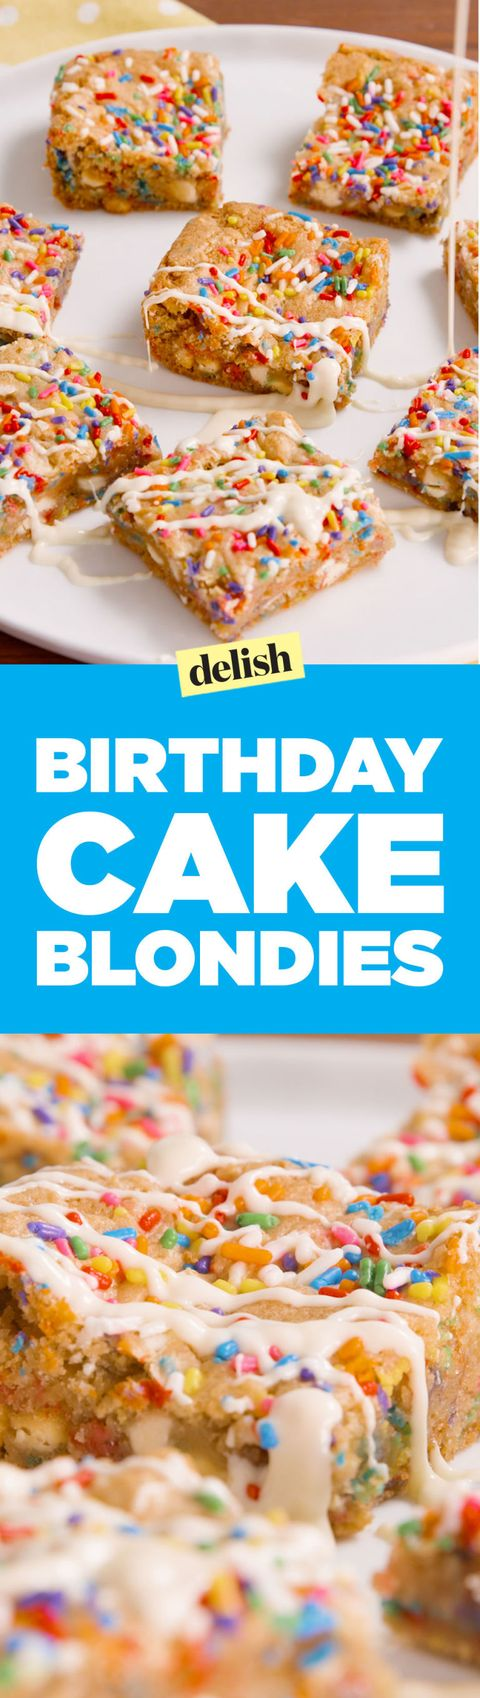 Prime Make Birthday Cake Blondies Best Birthday Cake Blondies Recipe Funny Birthday Cards Online Fluifree Goldxyz